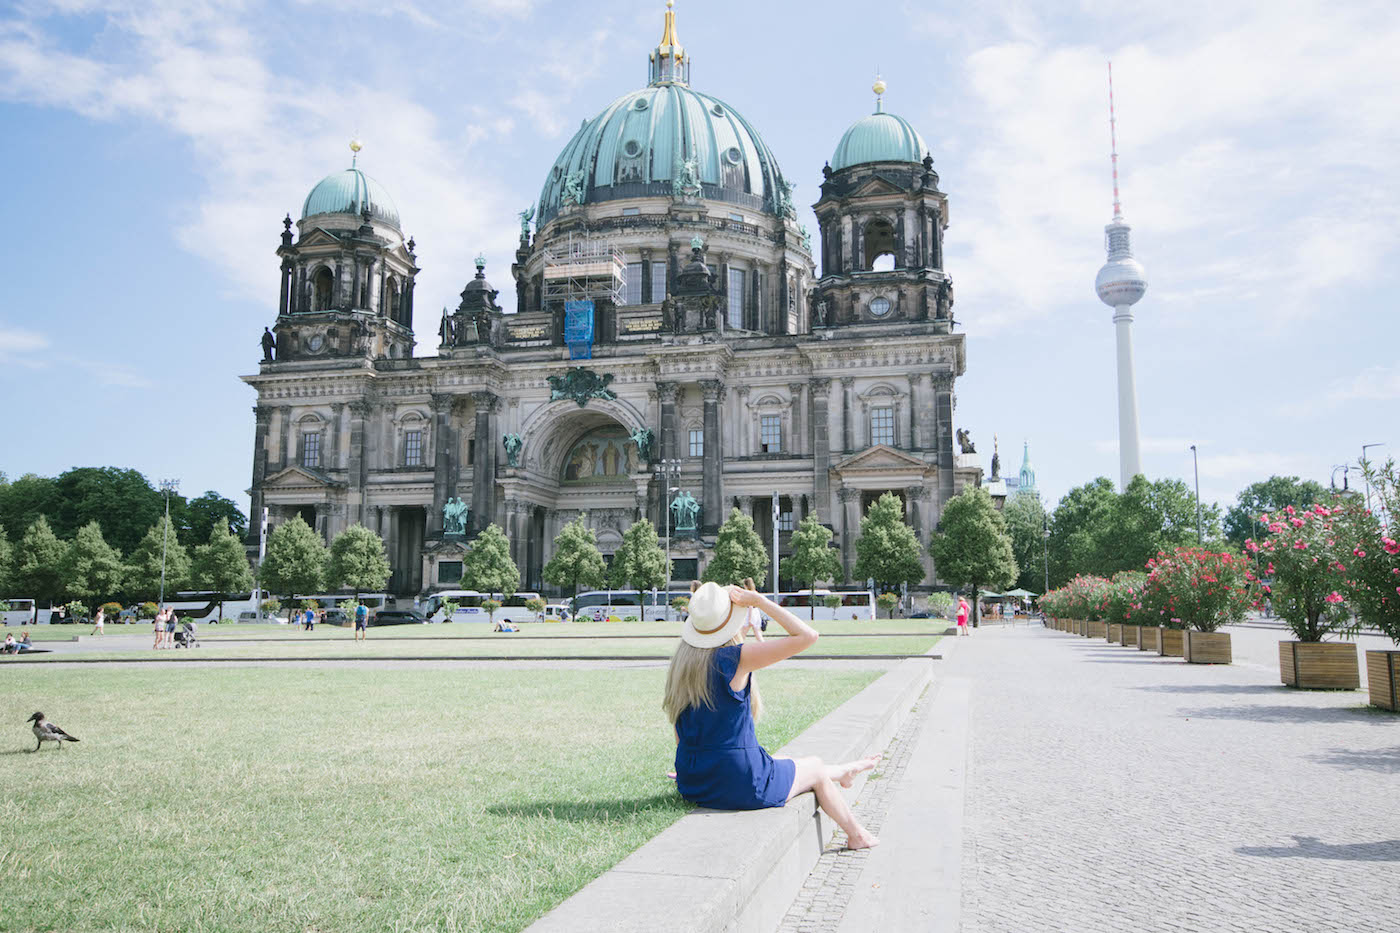 48-Stunden-Berlin-16